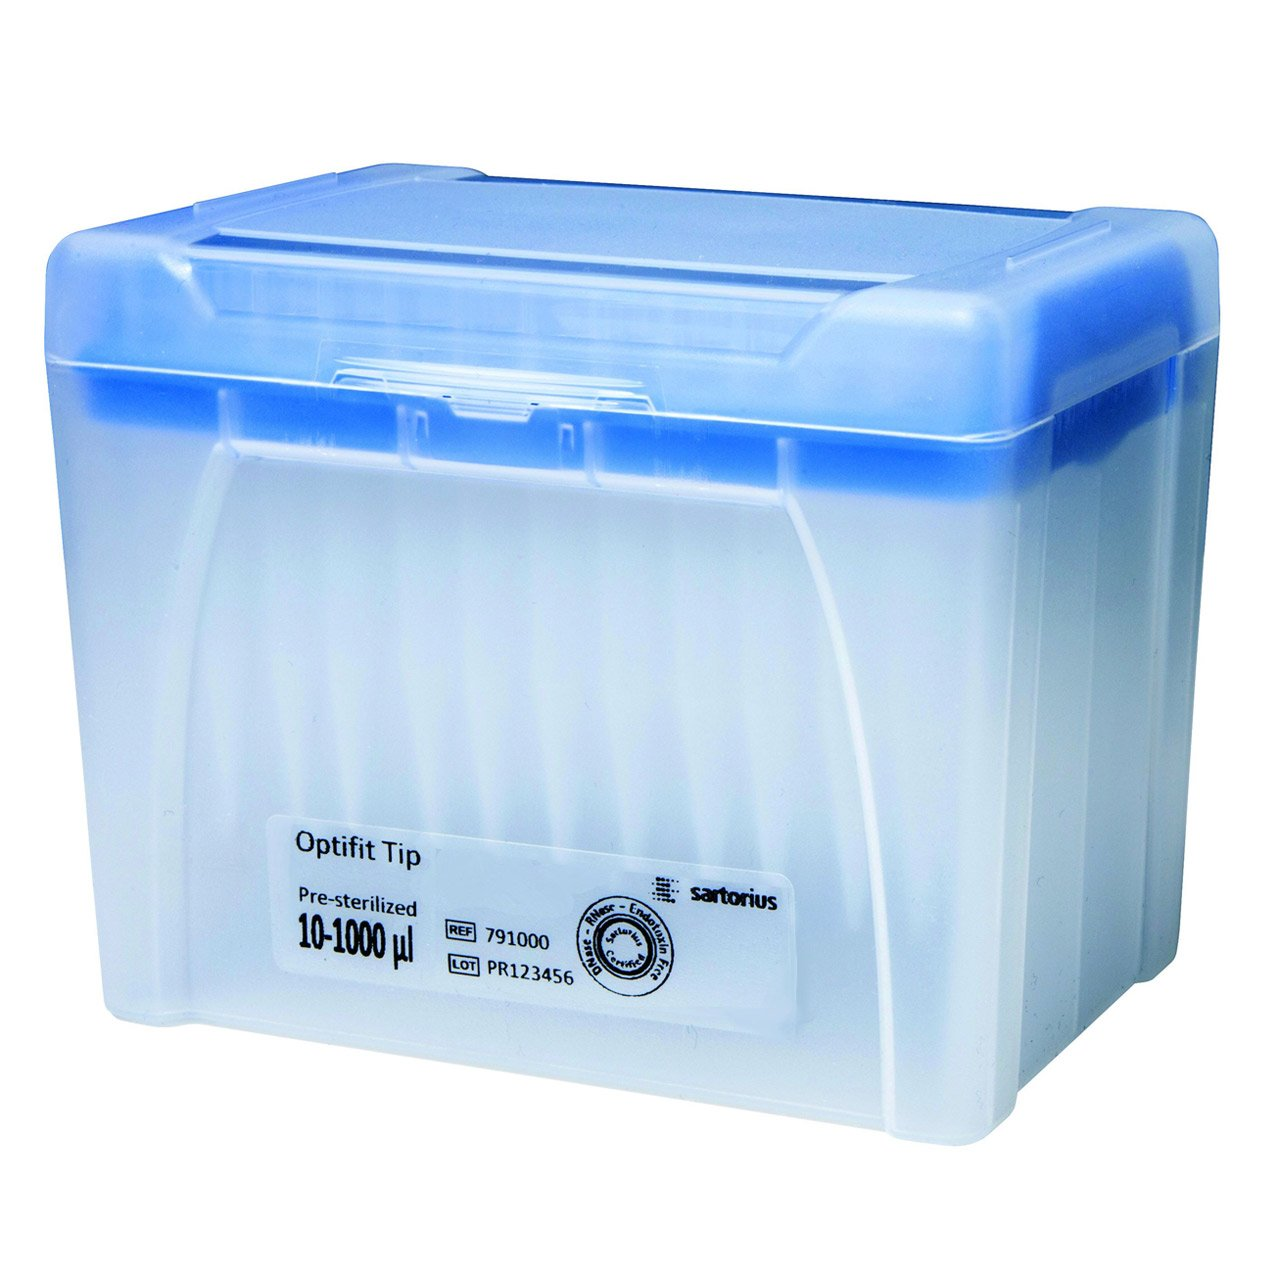 SafetySpace Filter Tip, 50-1000 µl (10 x 96)